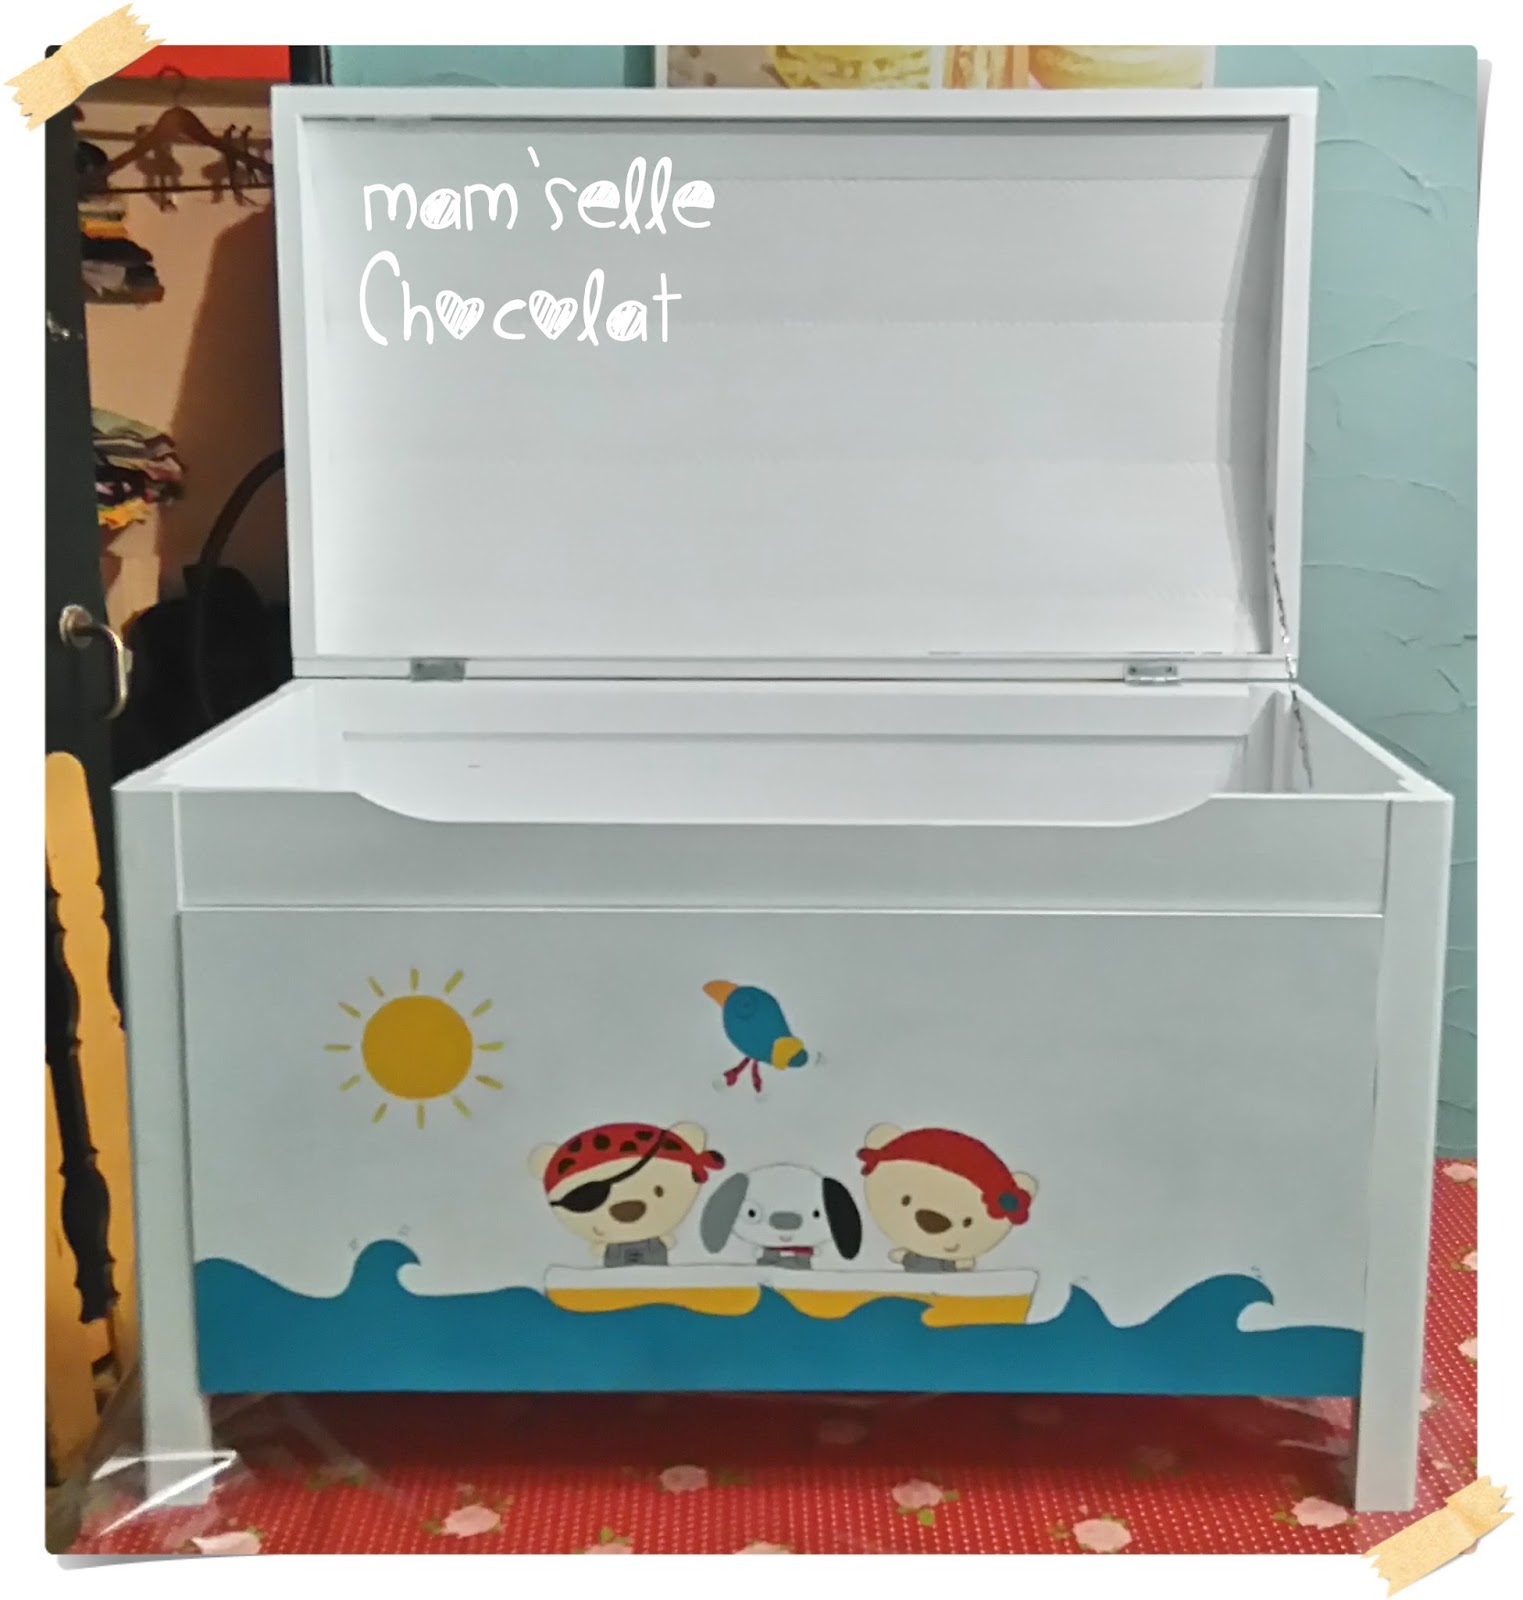 Pintar un ba l de madera con motivos infantiles - Baules infantiles para guardar juguetes ...